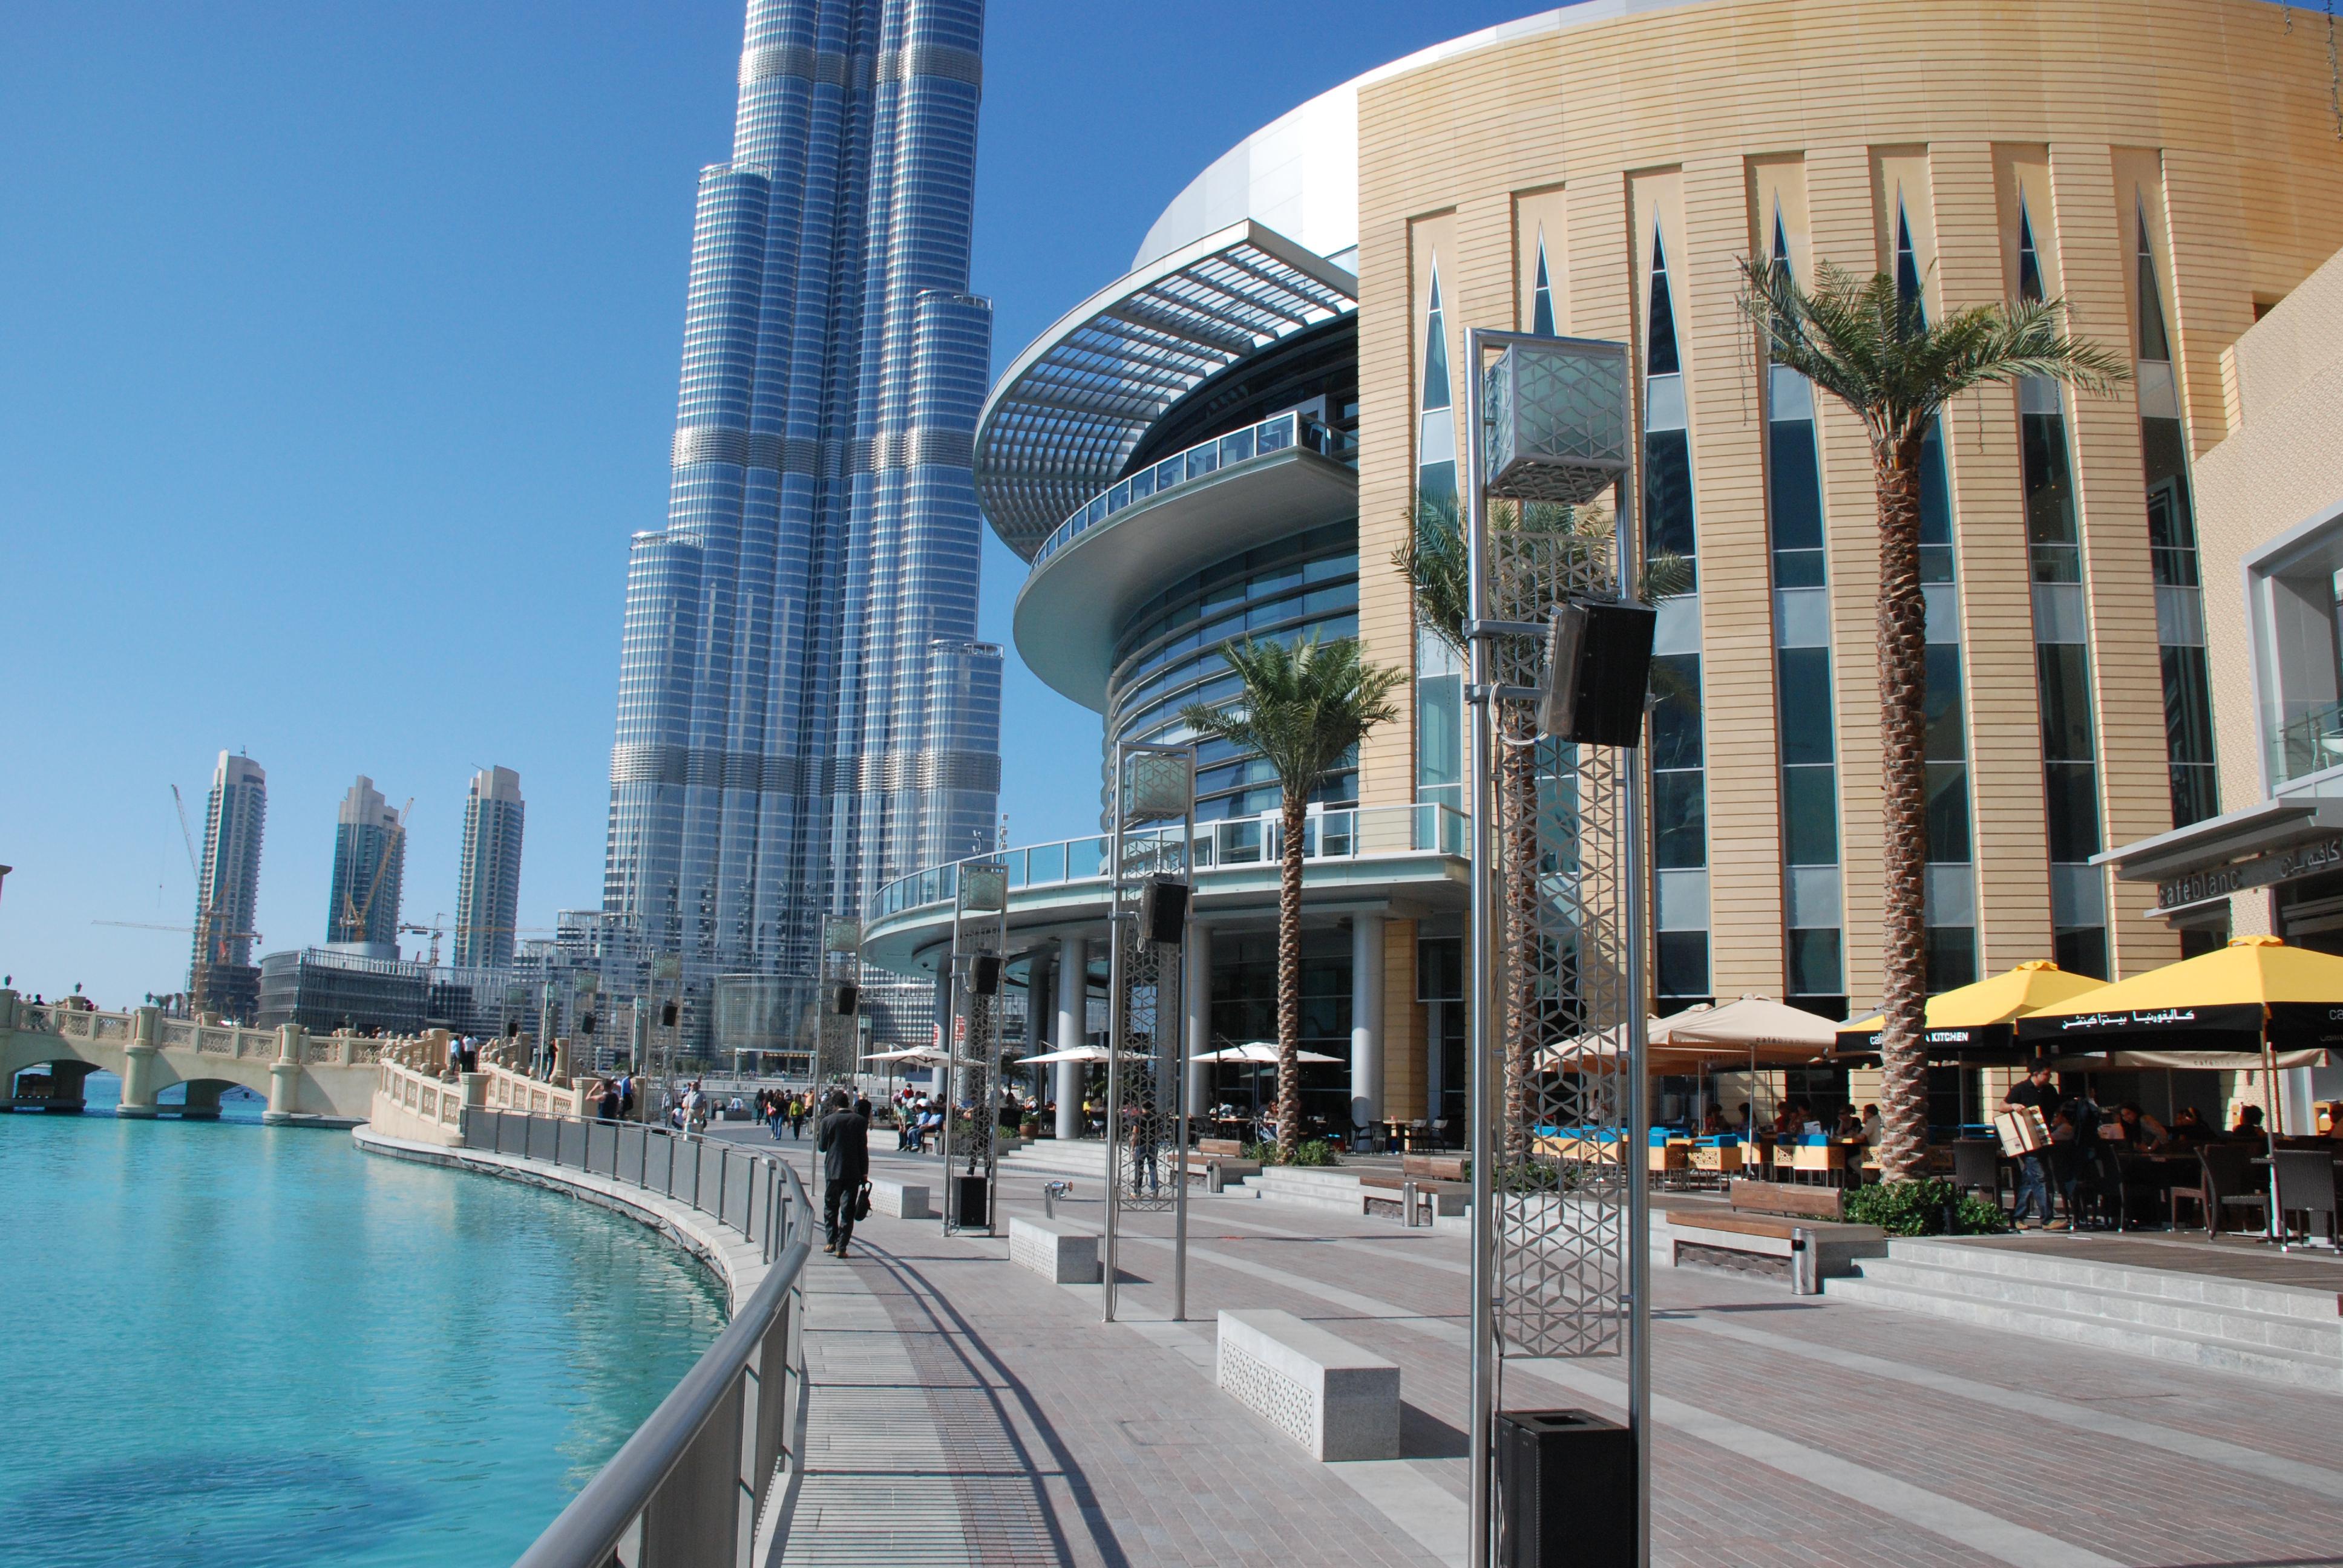 Image result for أماكن تجارية وسياحية شهيرة بدبي